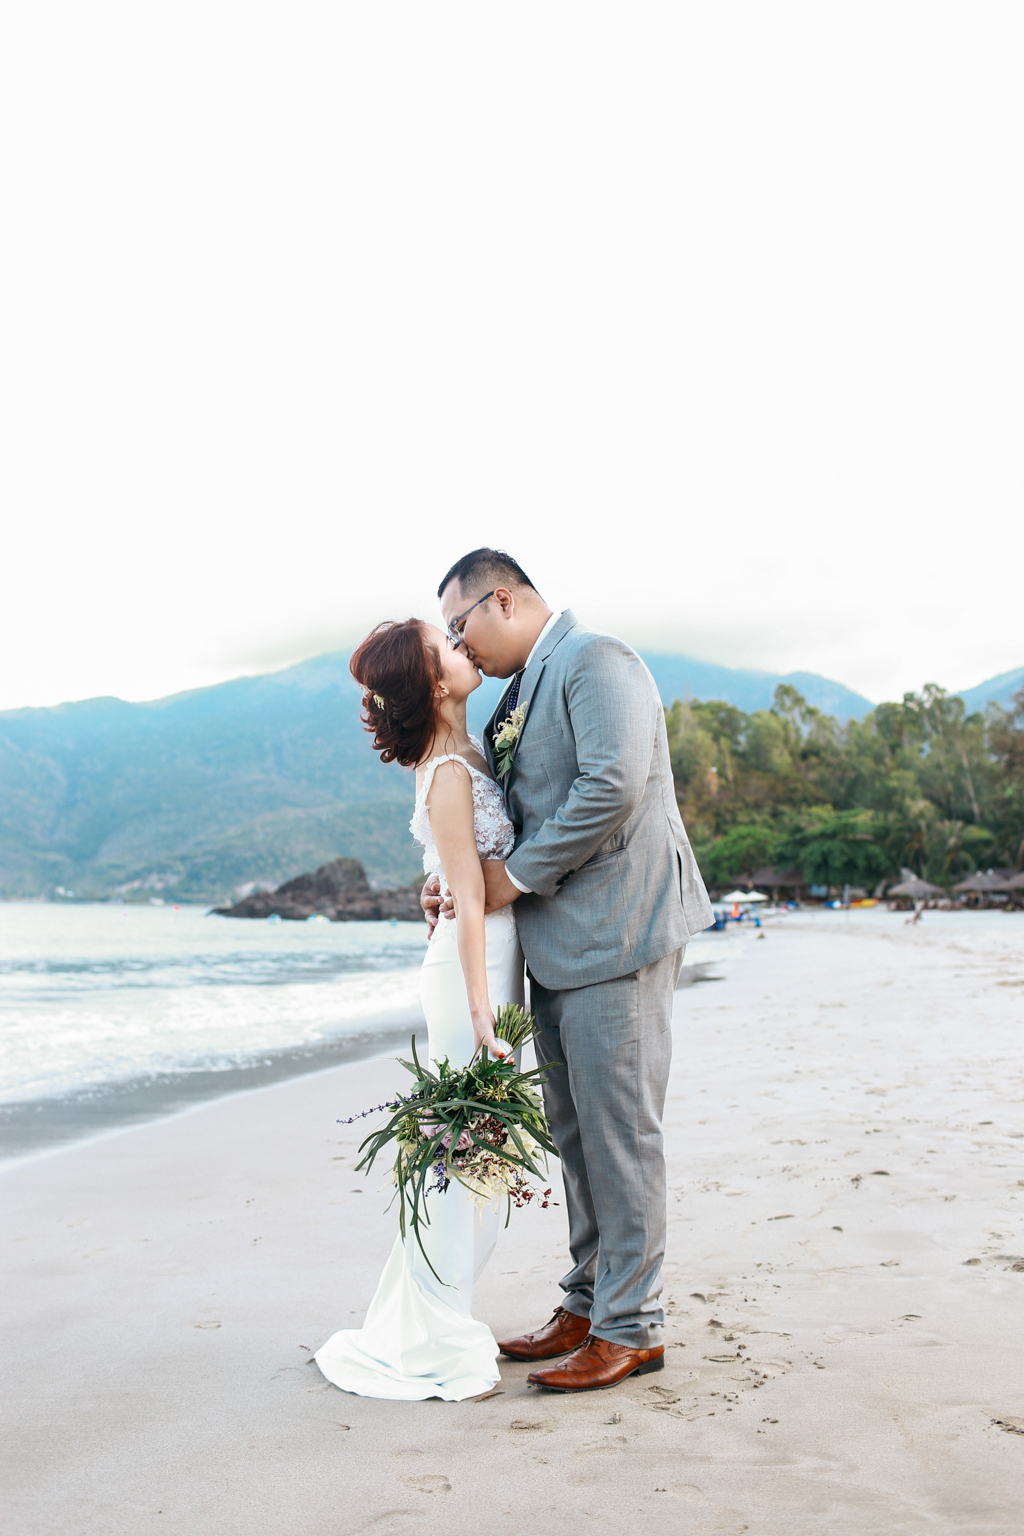 Dung-Minh-Indie-Wedding-78